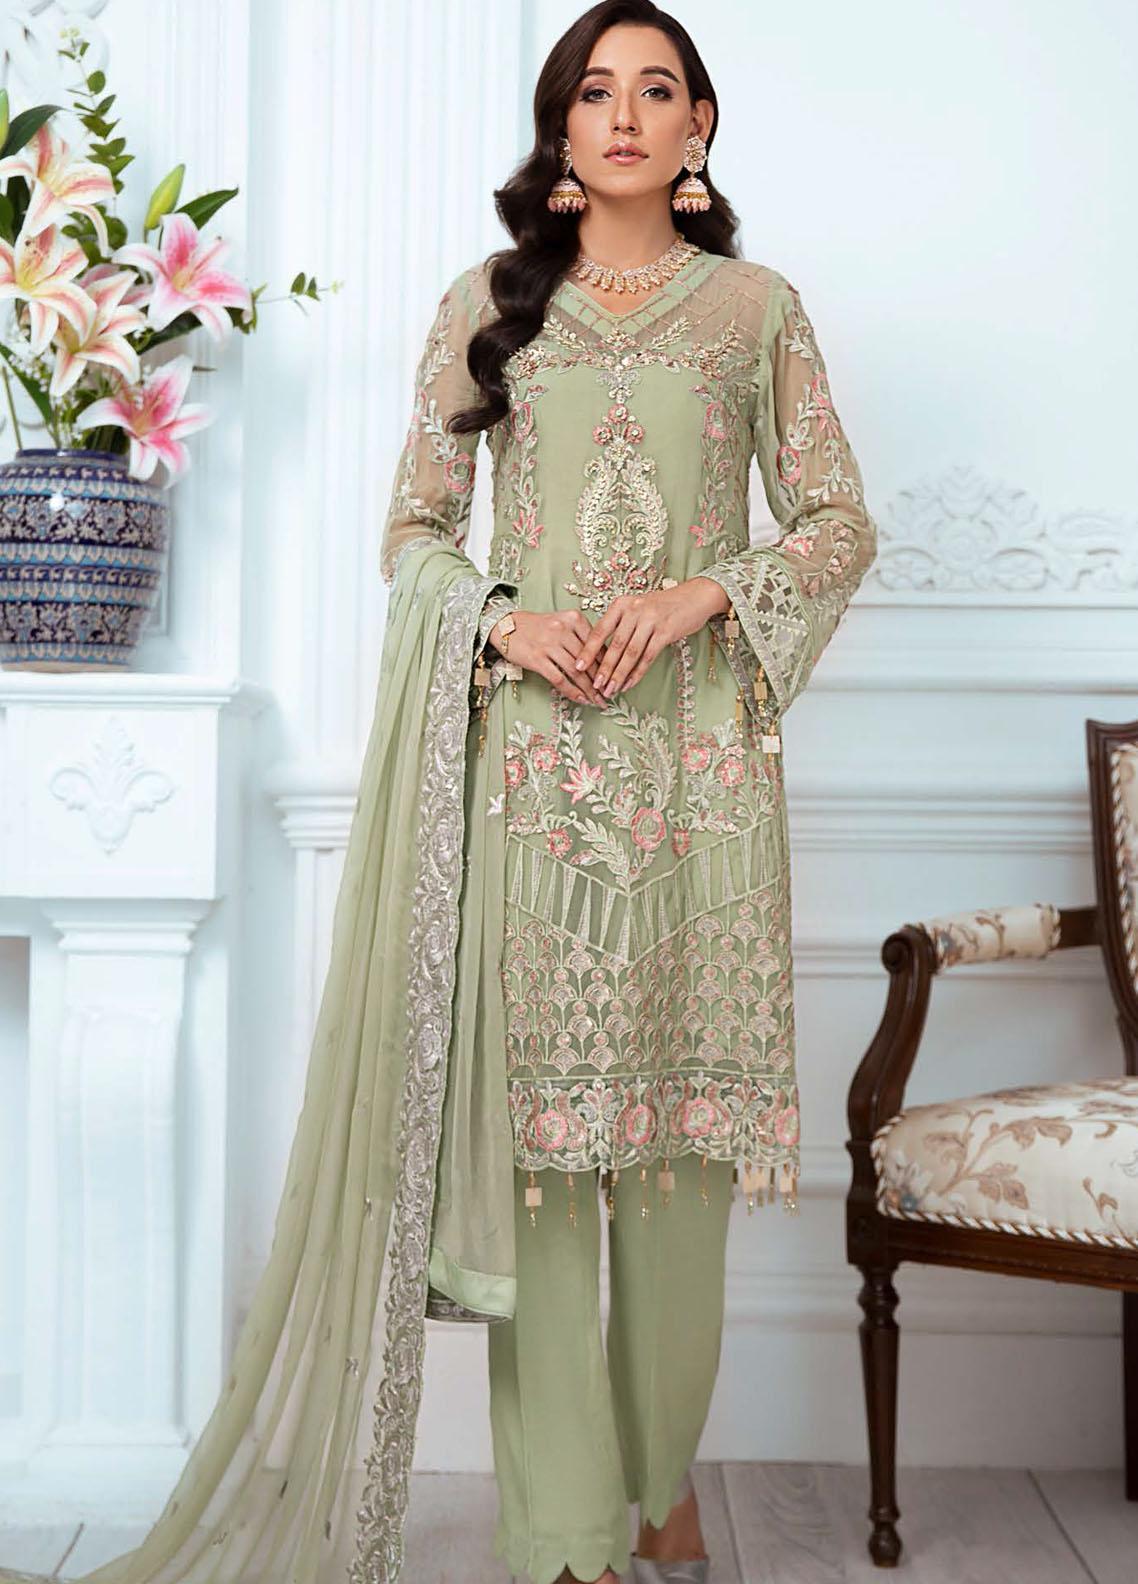 Zeenat by Zebtan Embroidered Chiffon Suits Unstitched 3 Piece ZBT21-6 ZN-06 - Luxury Collection